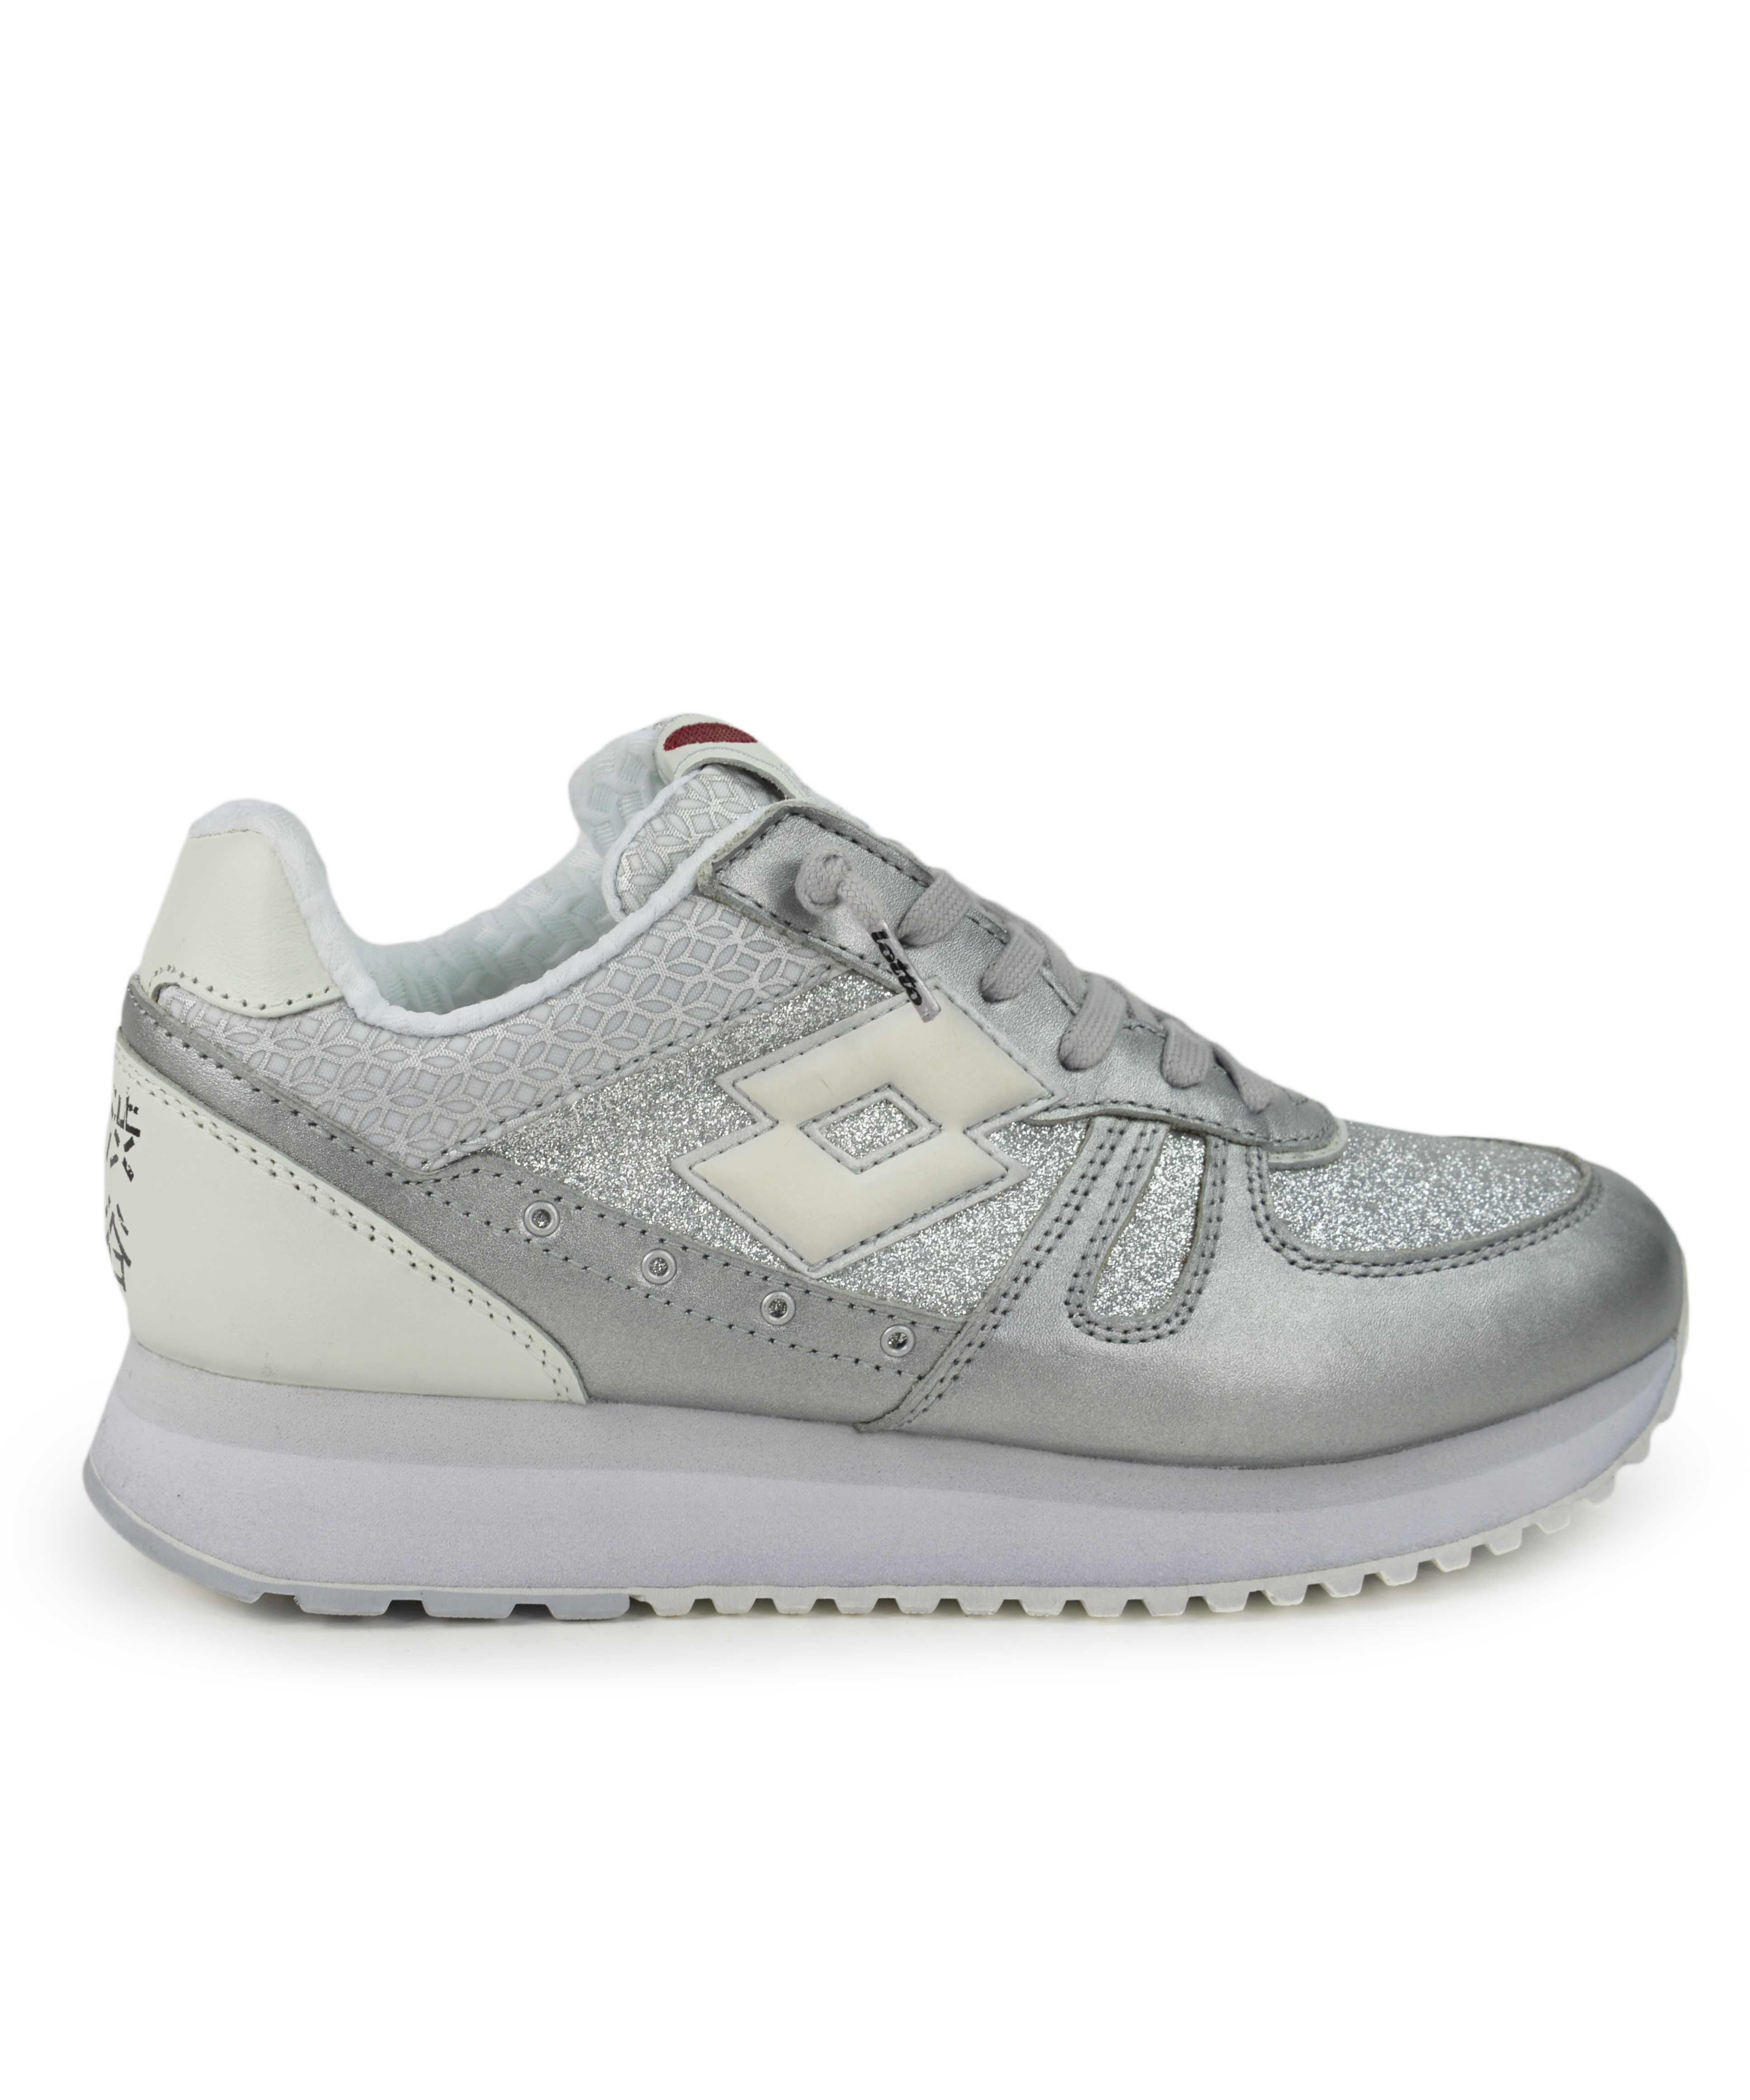 71a497dd3fbf4 Sneaker da donna Lotto Tokyo Shibuya argento